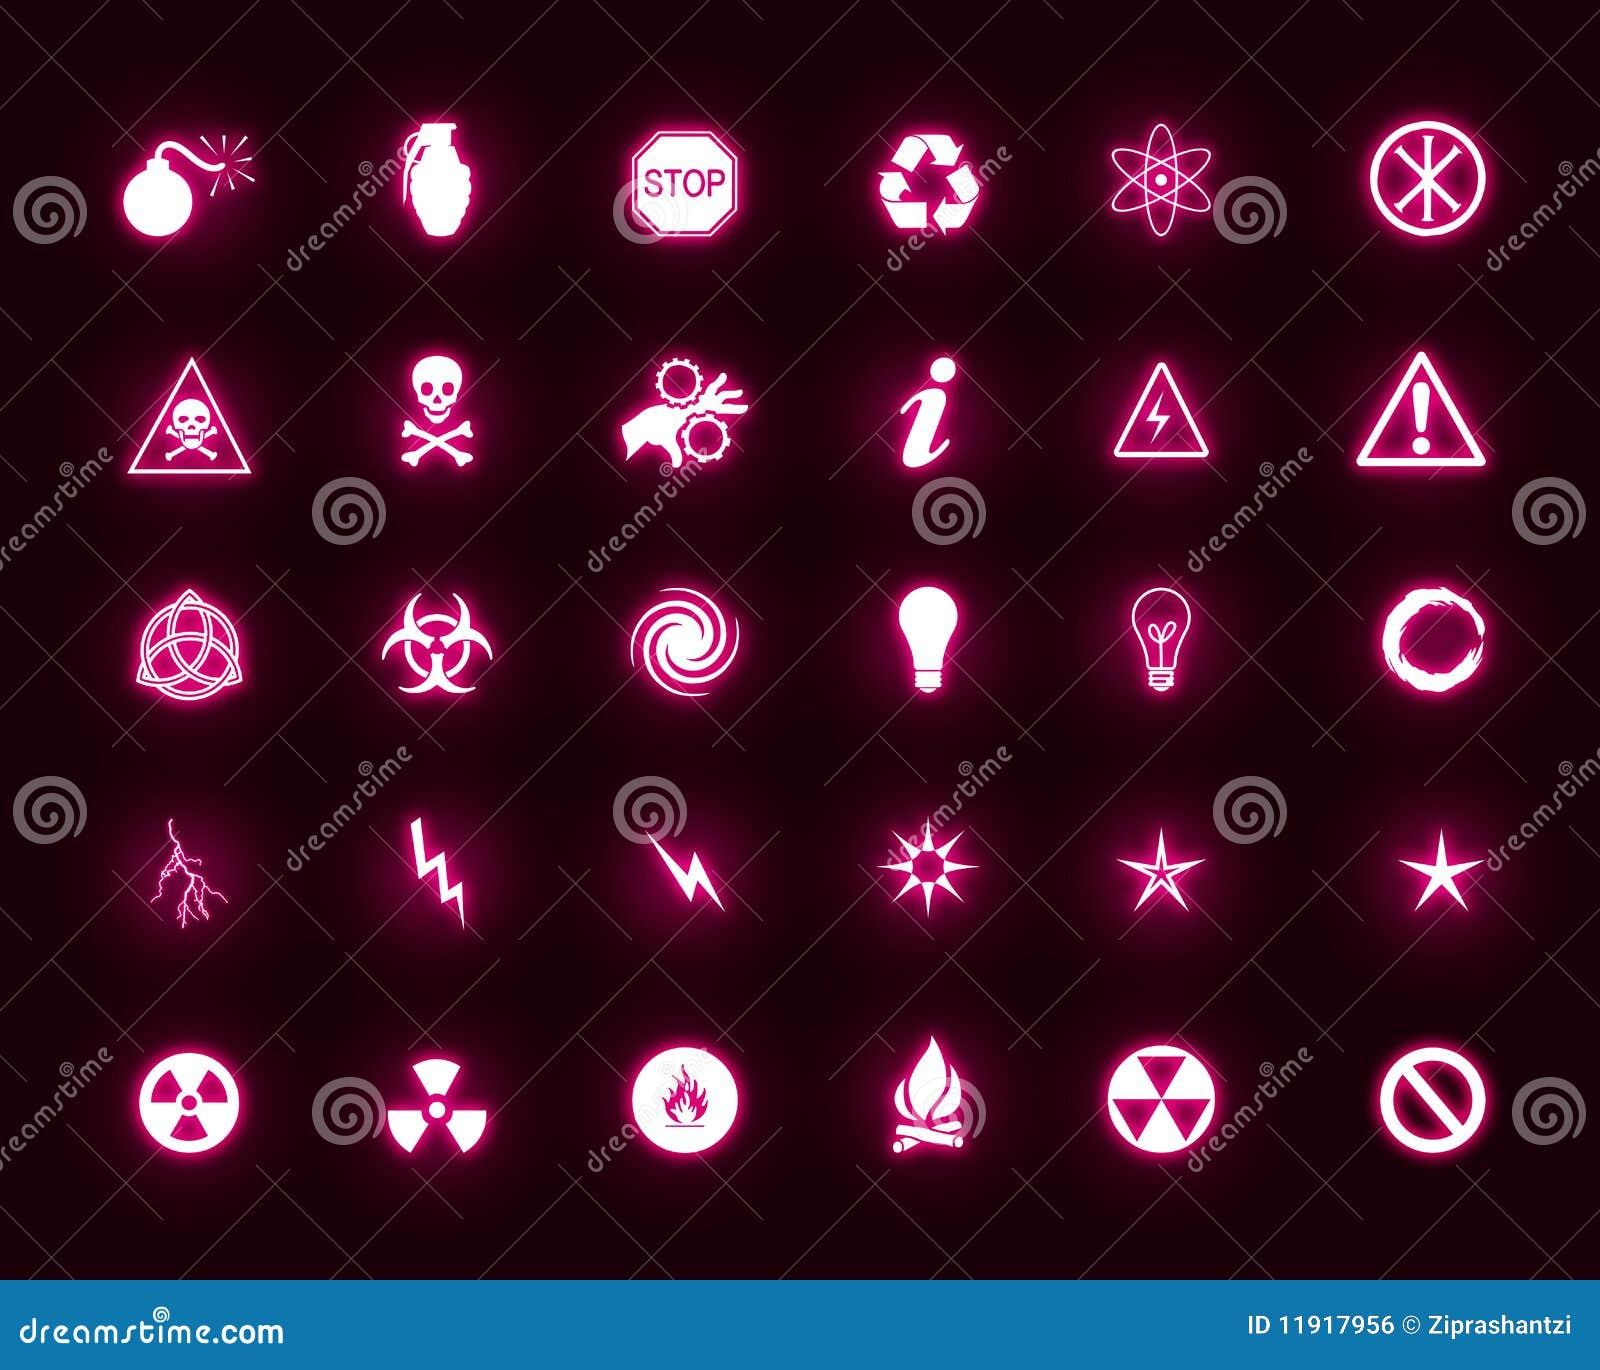 Energatic web icons